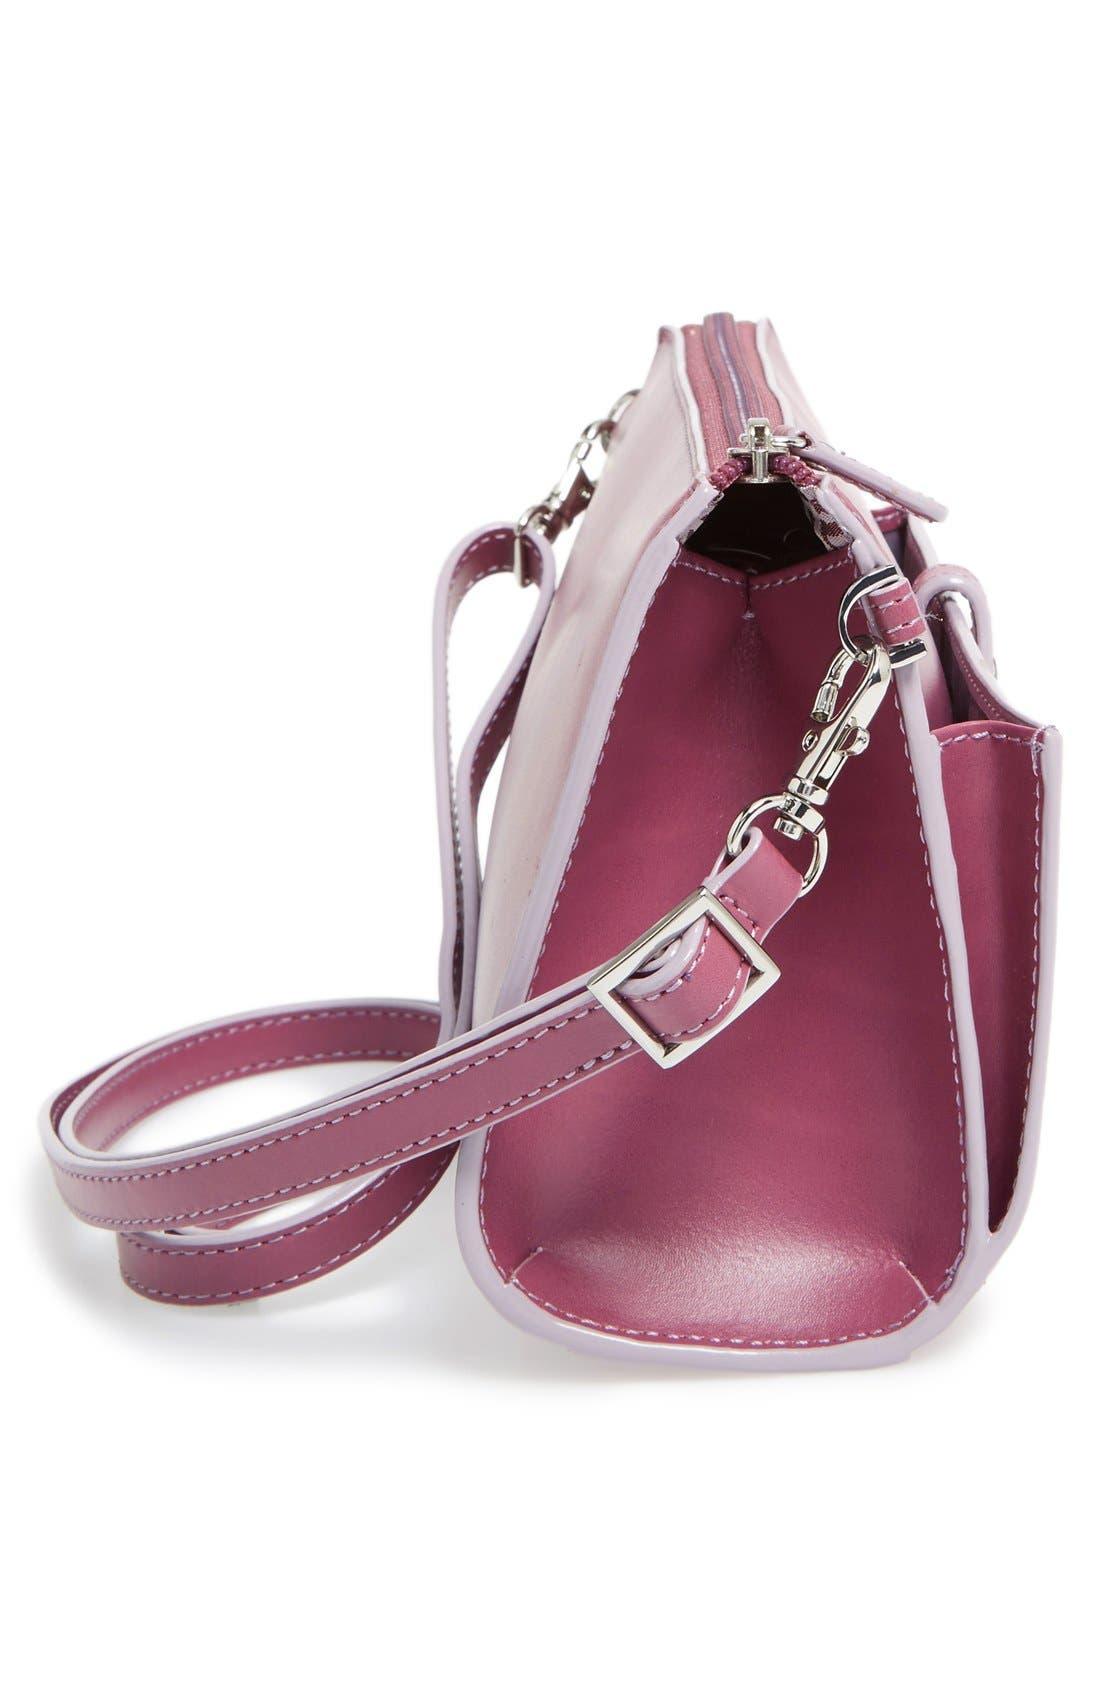 Lodis'Audrey Collection -Vicky' ConvertibleCrossbody Bag,                             Alternate thumbnail 24, color,